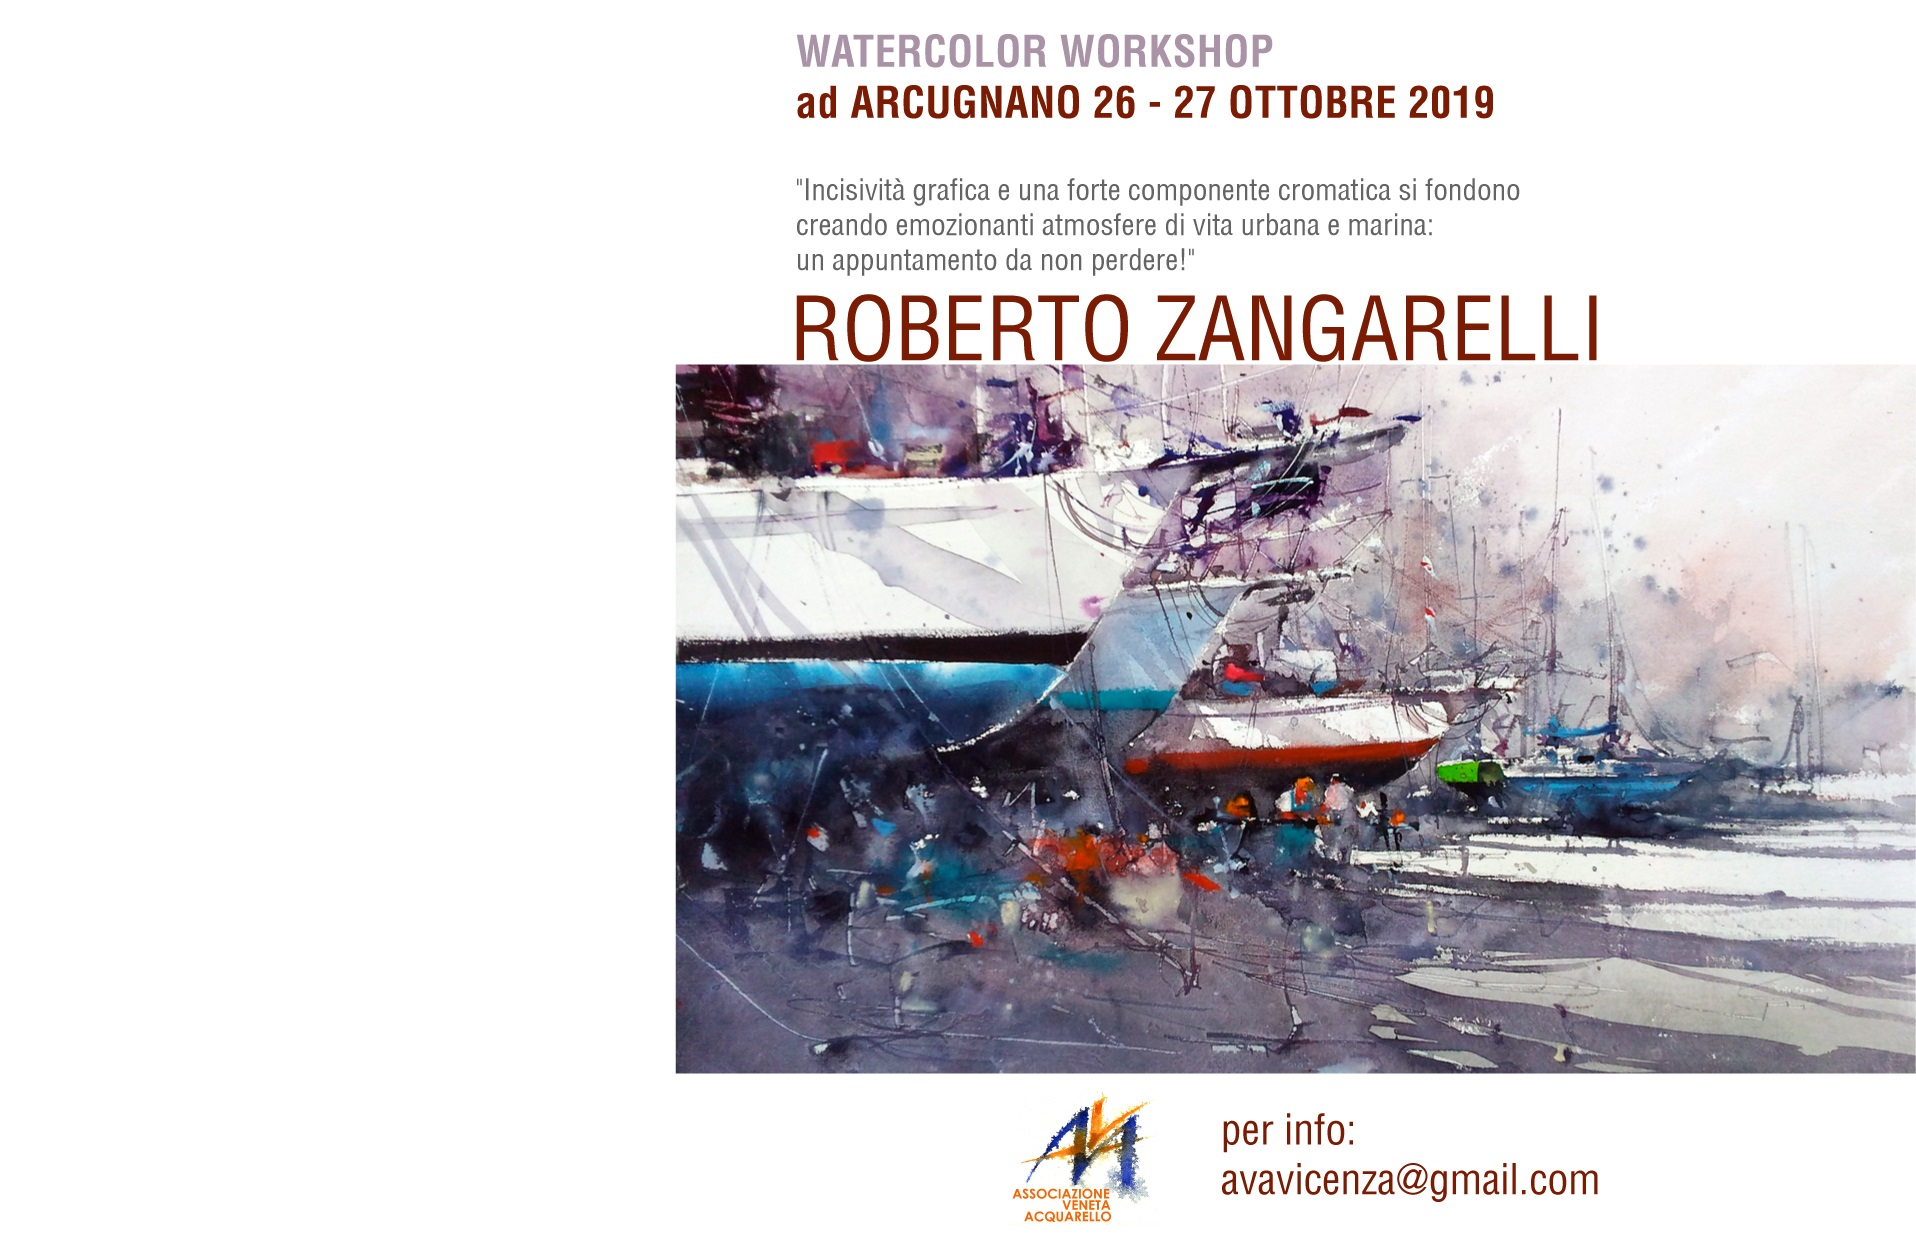 Roberto Zangarelli